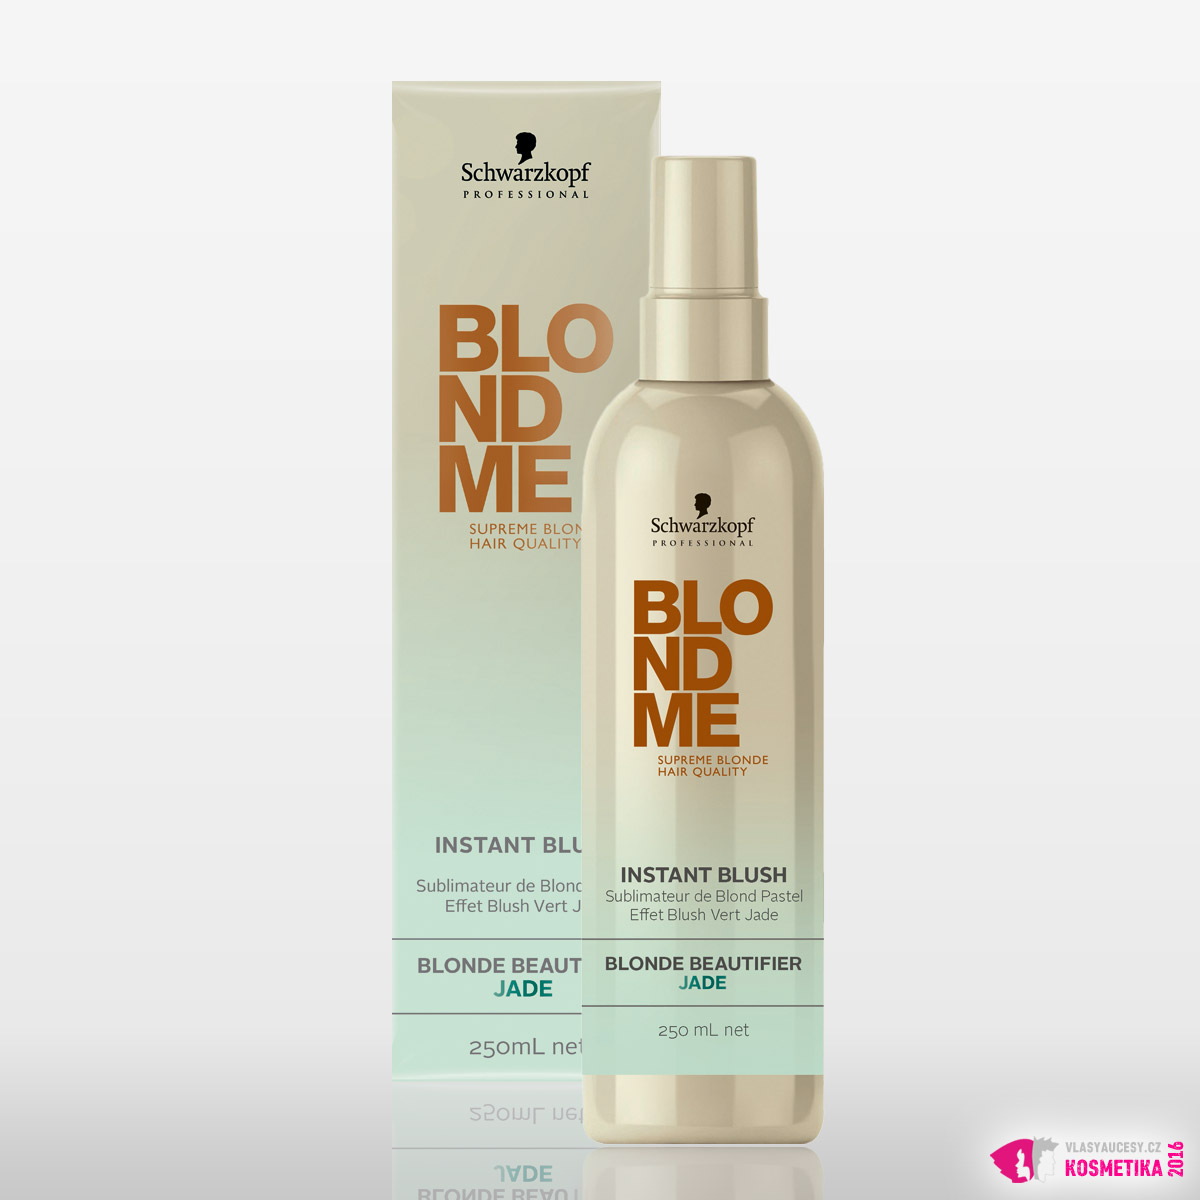 BlondMe Instant Blush - Blonde Beautifier Jade od Schwarzkopf Professional